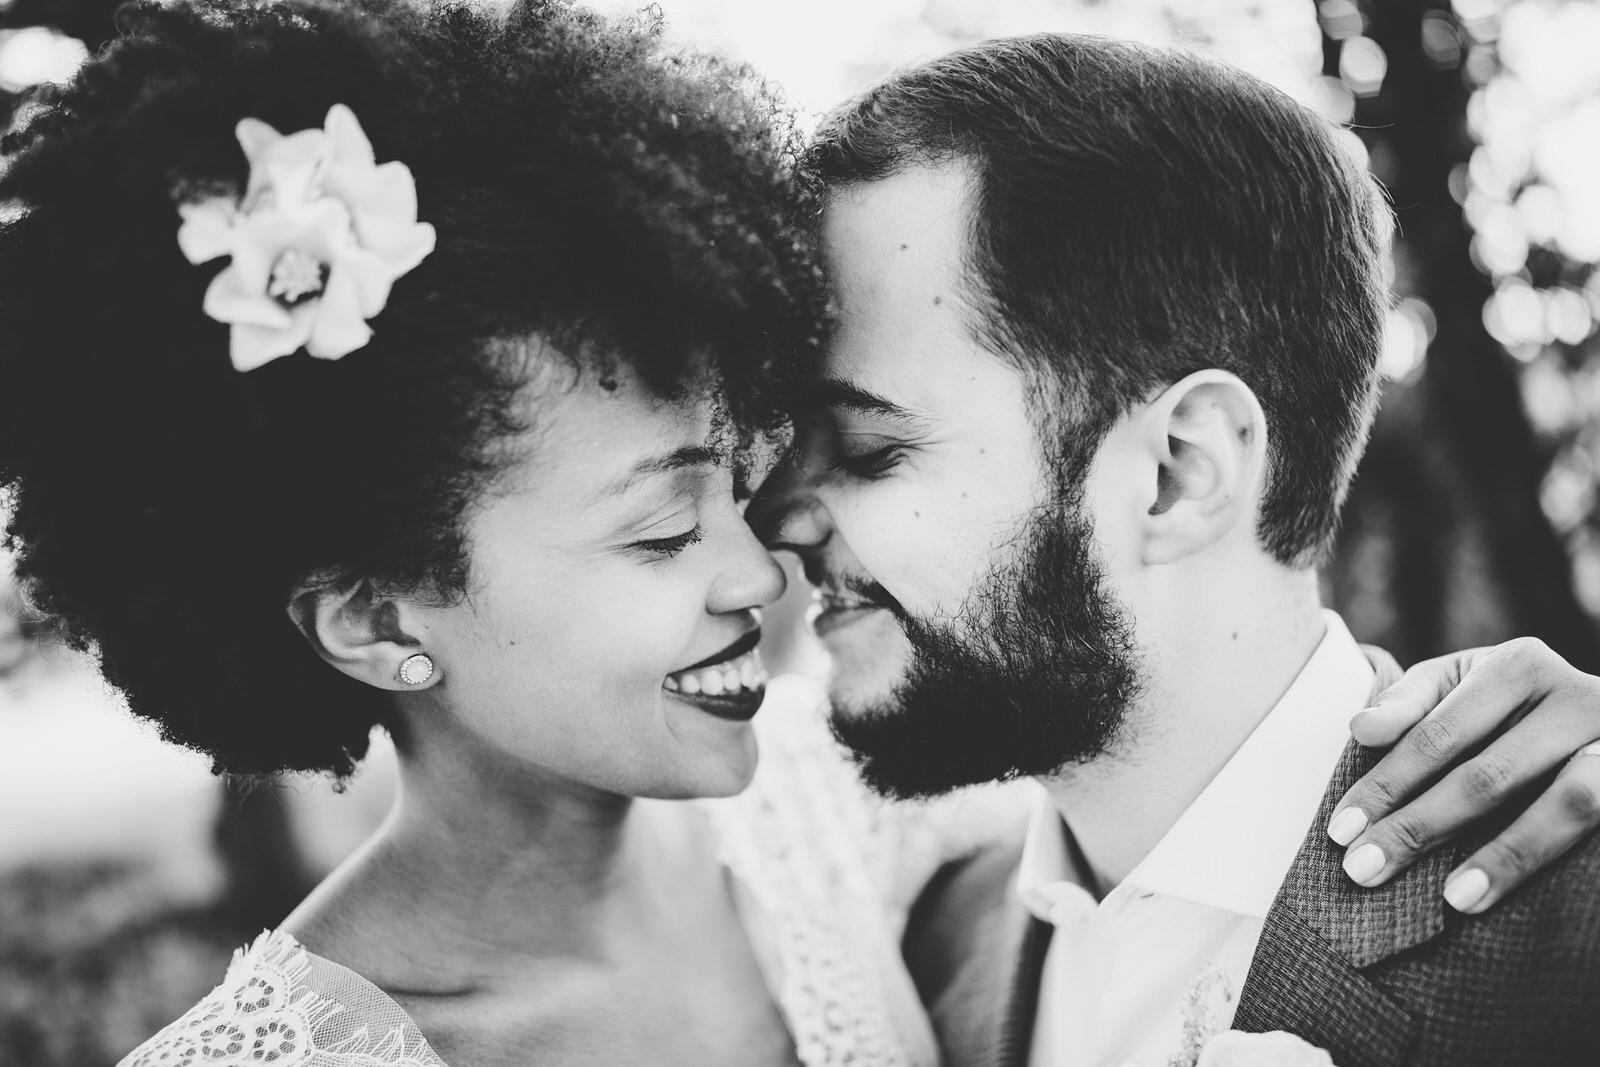 wedding photographer in italy-venice-tuscany-florence-amalfi coast-como lake-villa del balbianello-siena-amalfi-ravello-belmond-villa cimbrone62